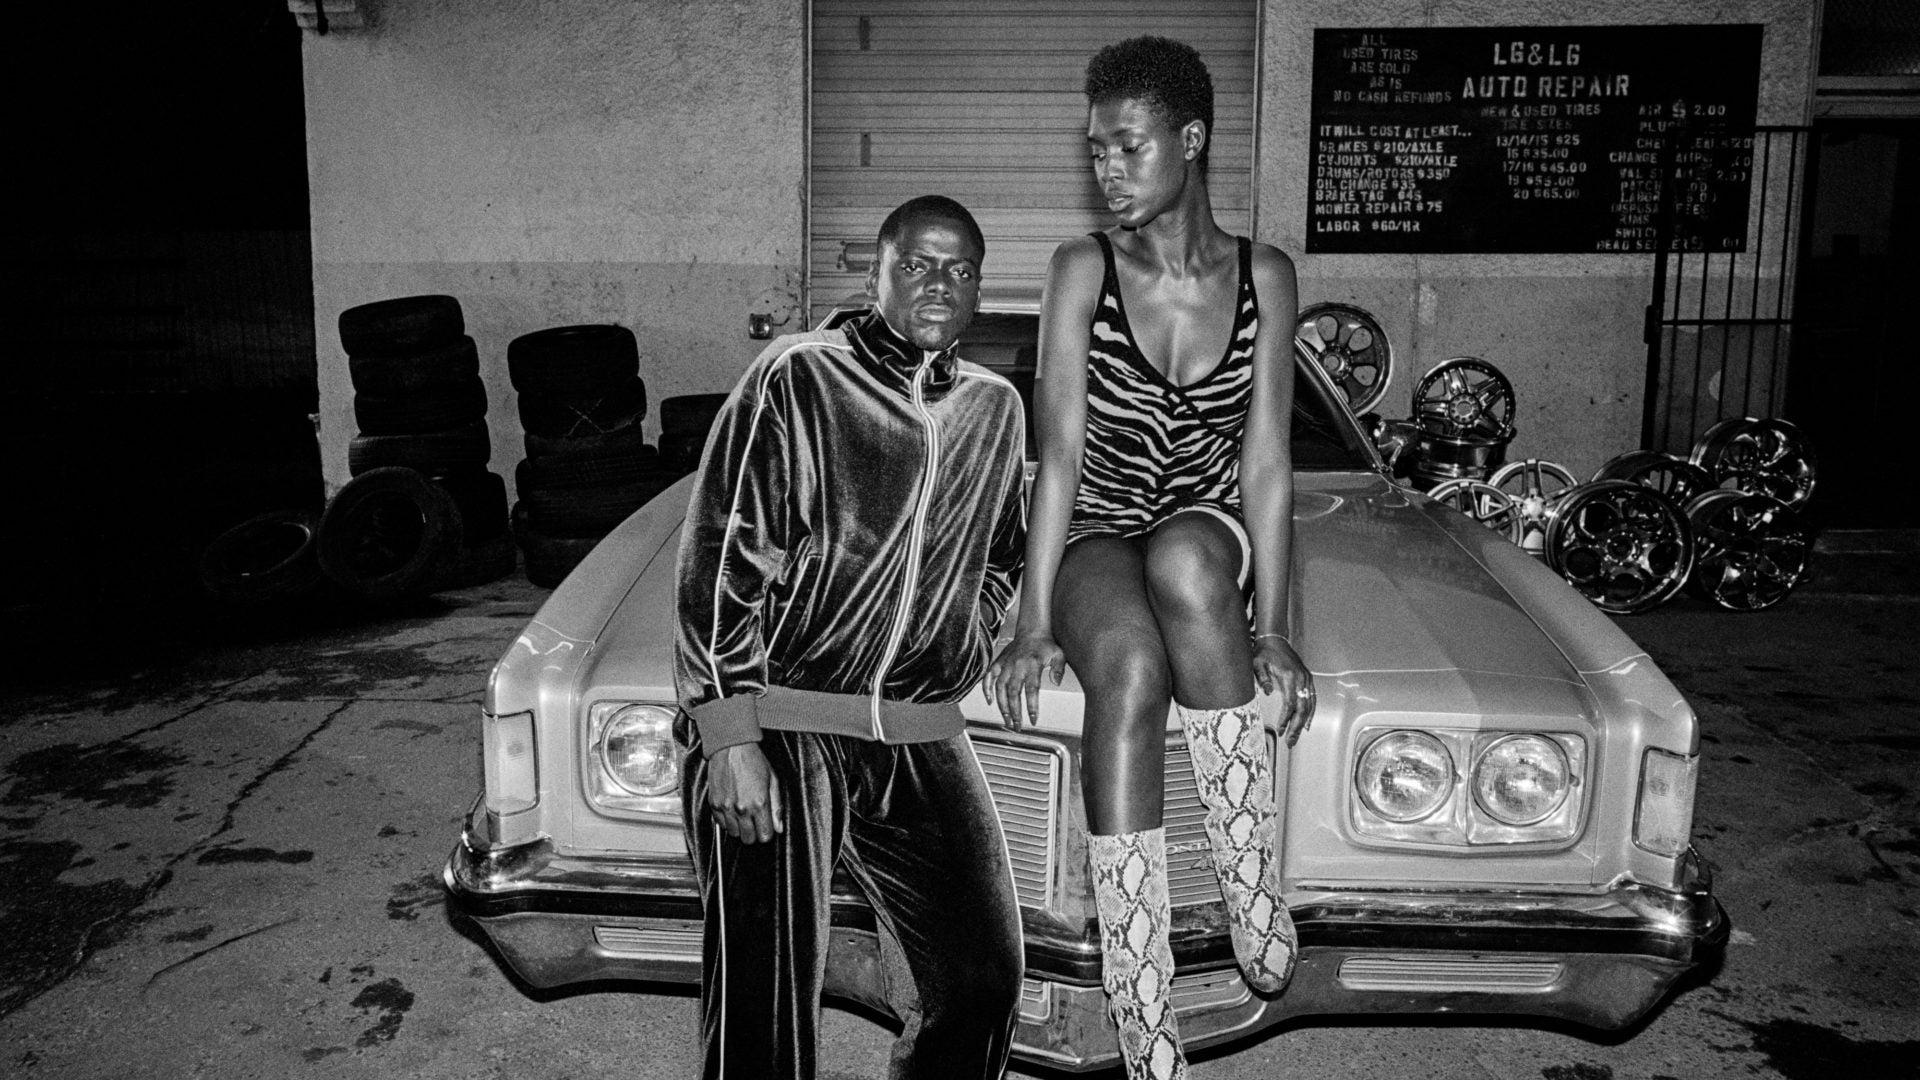 'Queen & Slim' Will Premiere At AFI Fest 2019